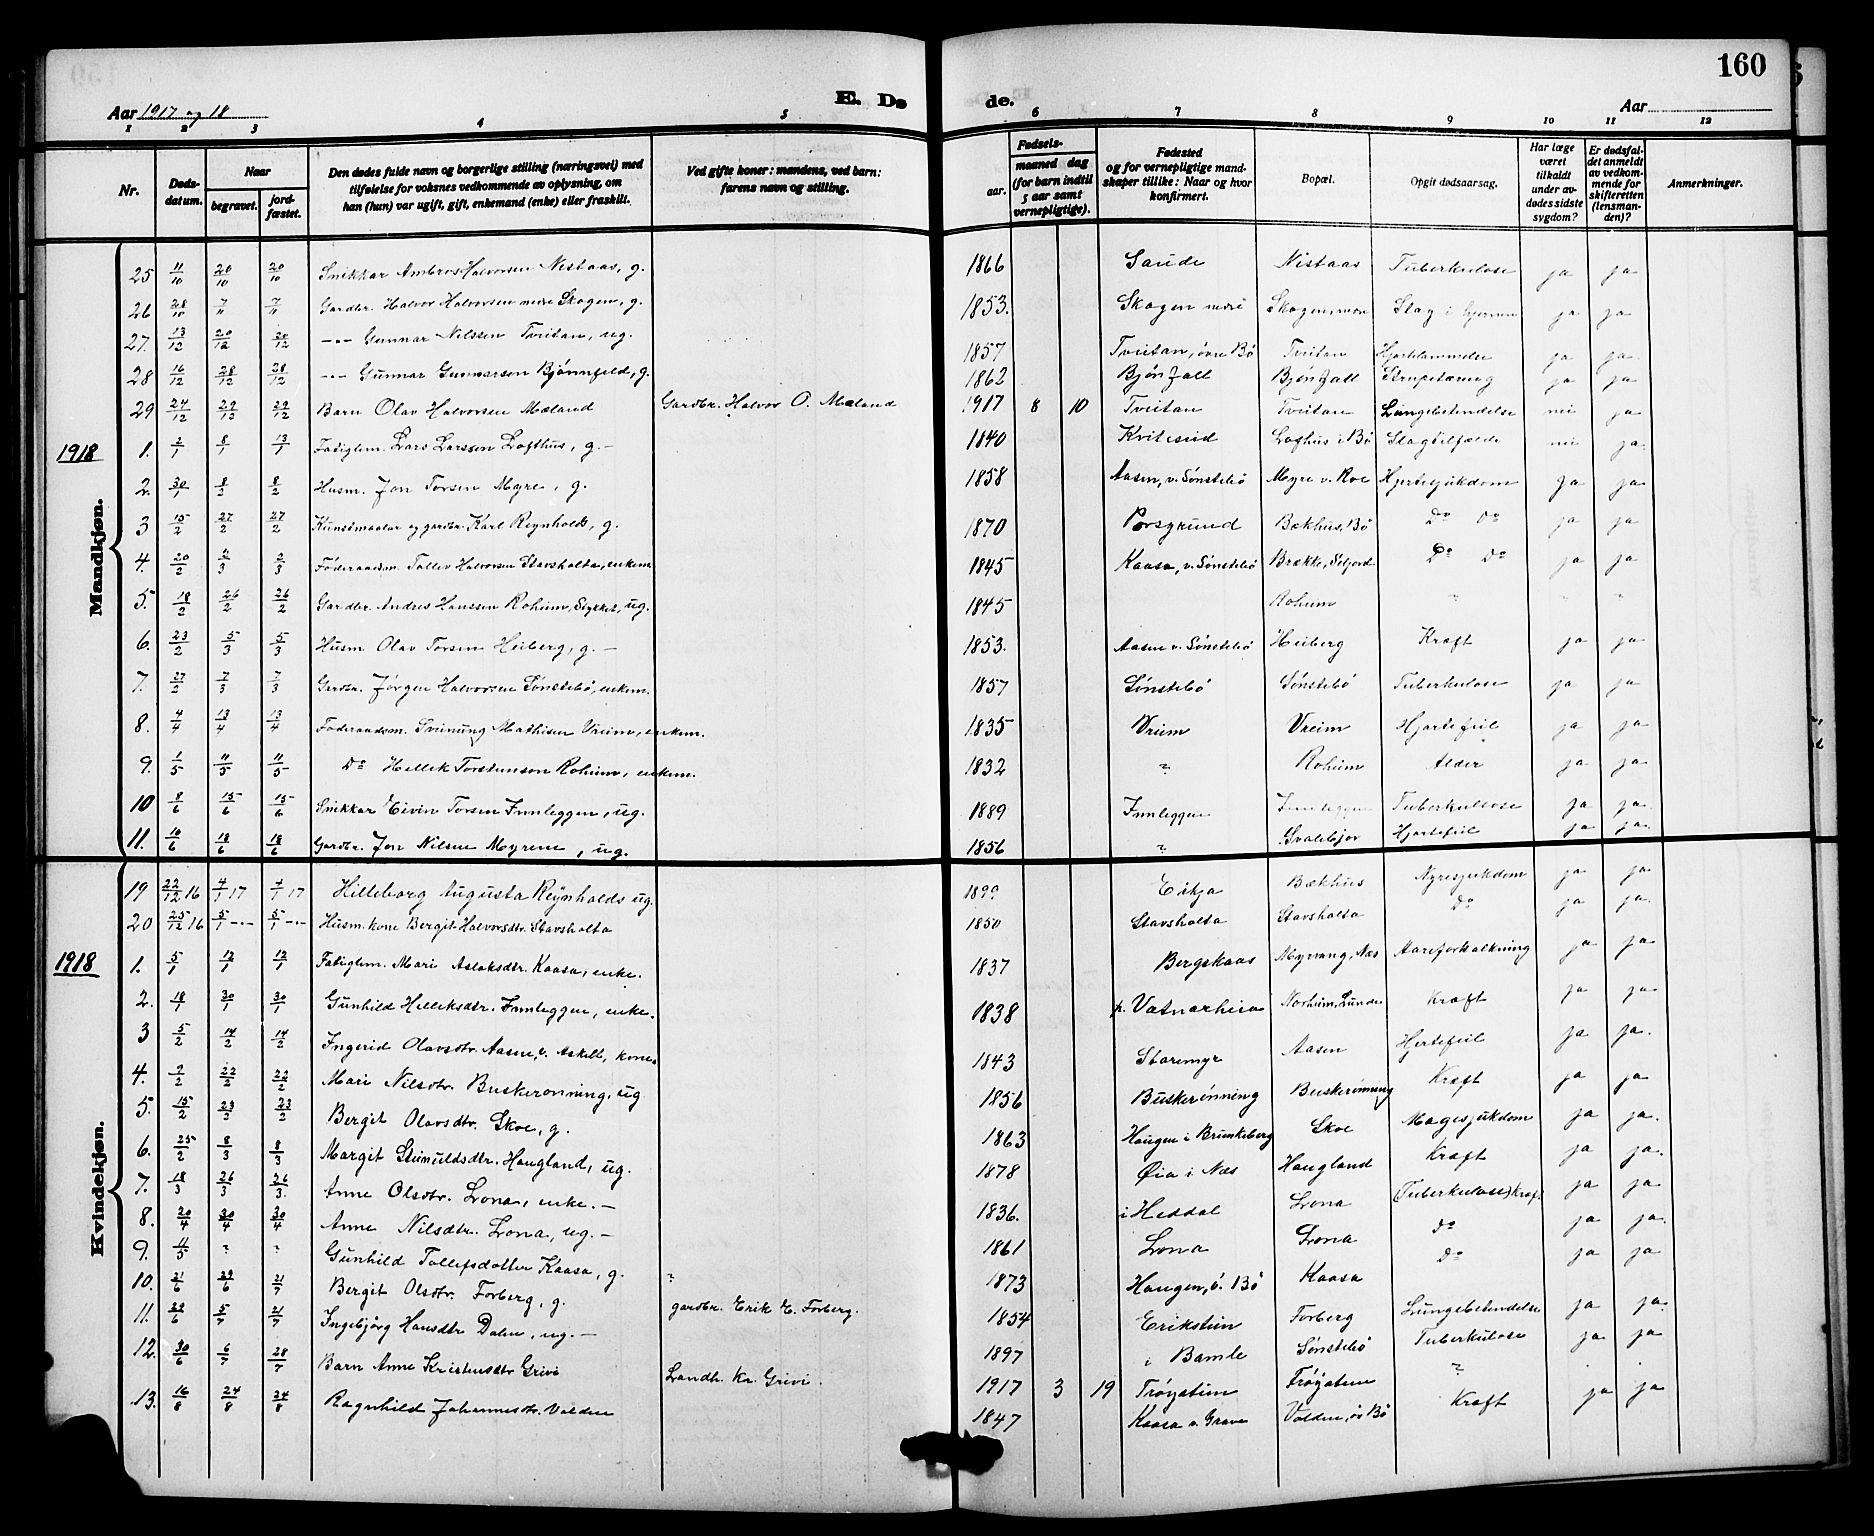 SAKO, Bø kirkebøker, G/Ga/L0007: Klokkerbok nr. 7, 1909-1924, s. 160